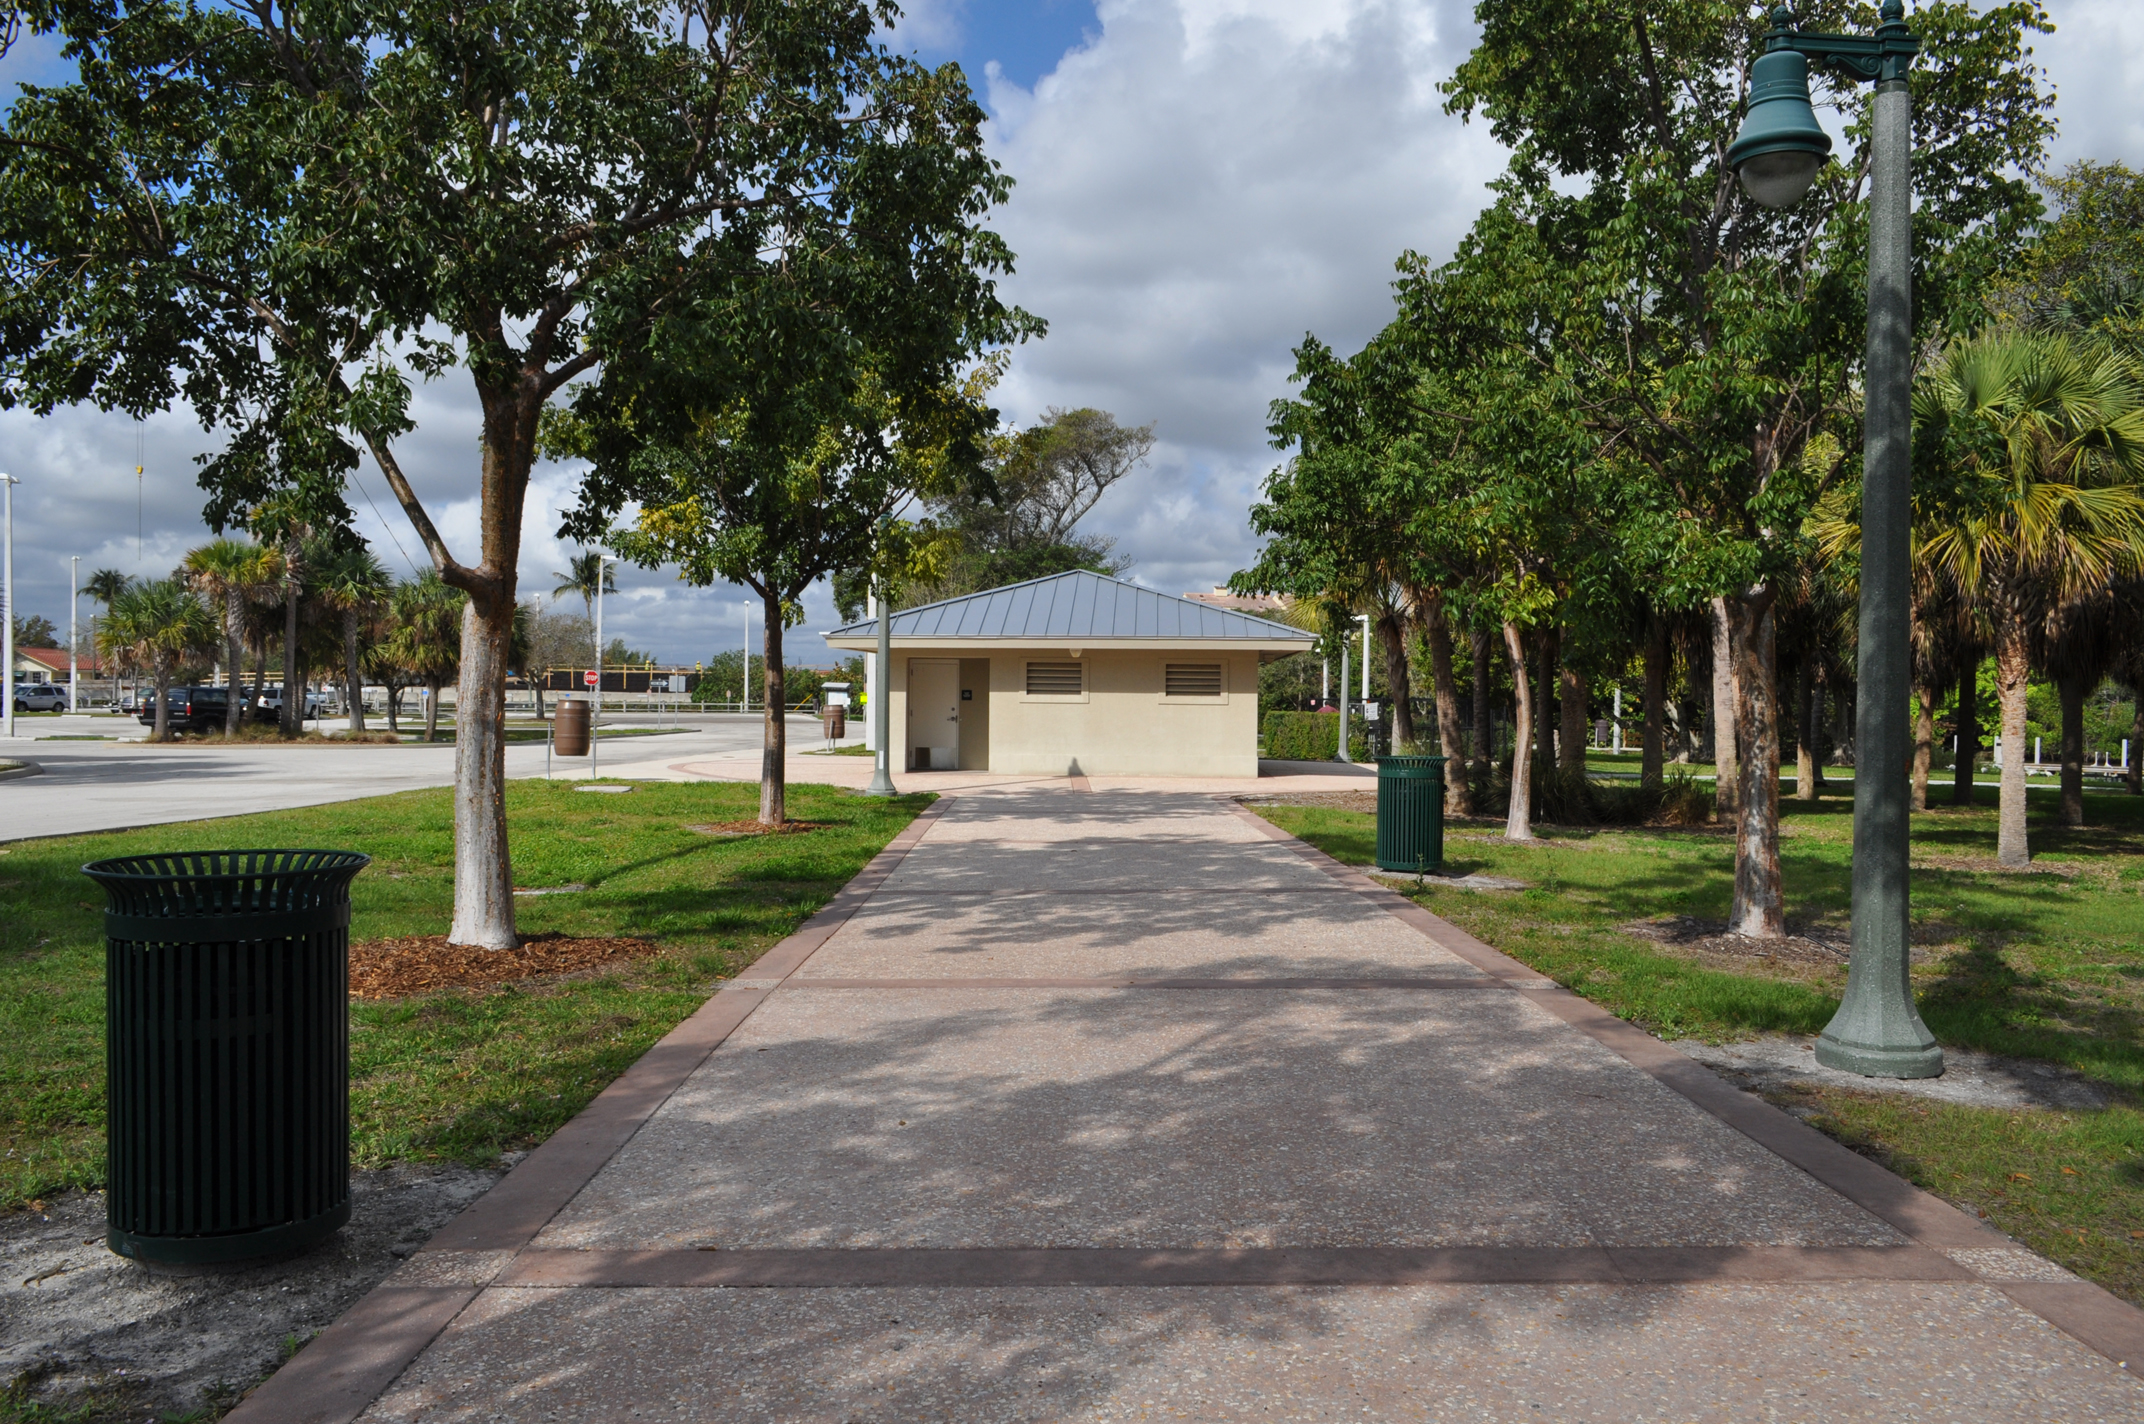 Burt Reynolds Park Palm Beach County Florida Riverwalk Tabby Concrete.JPG